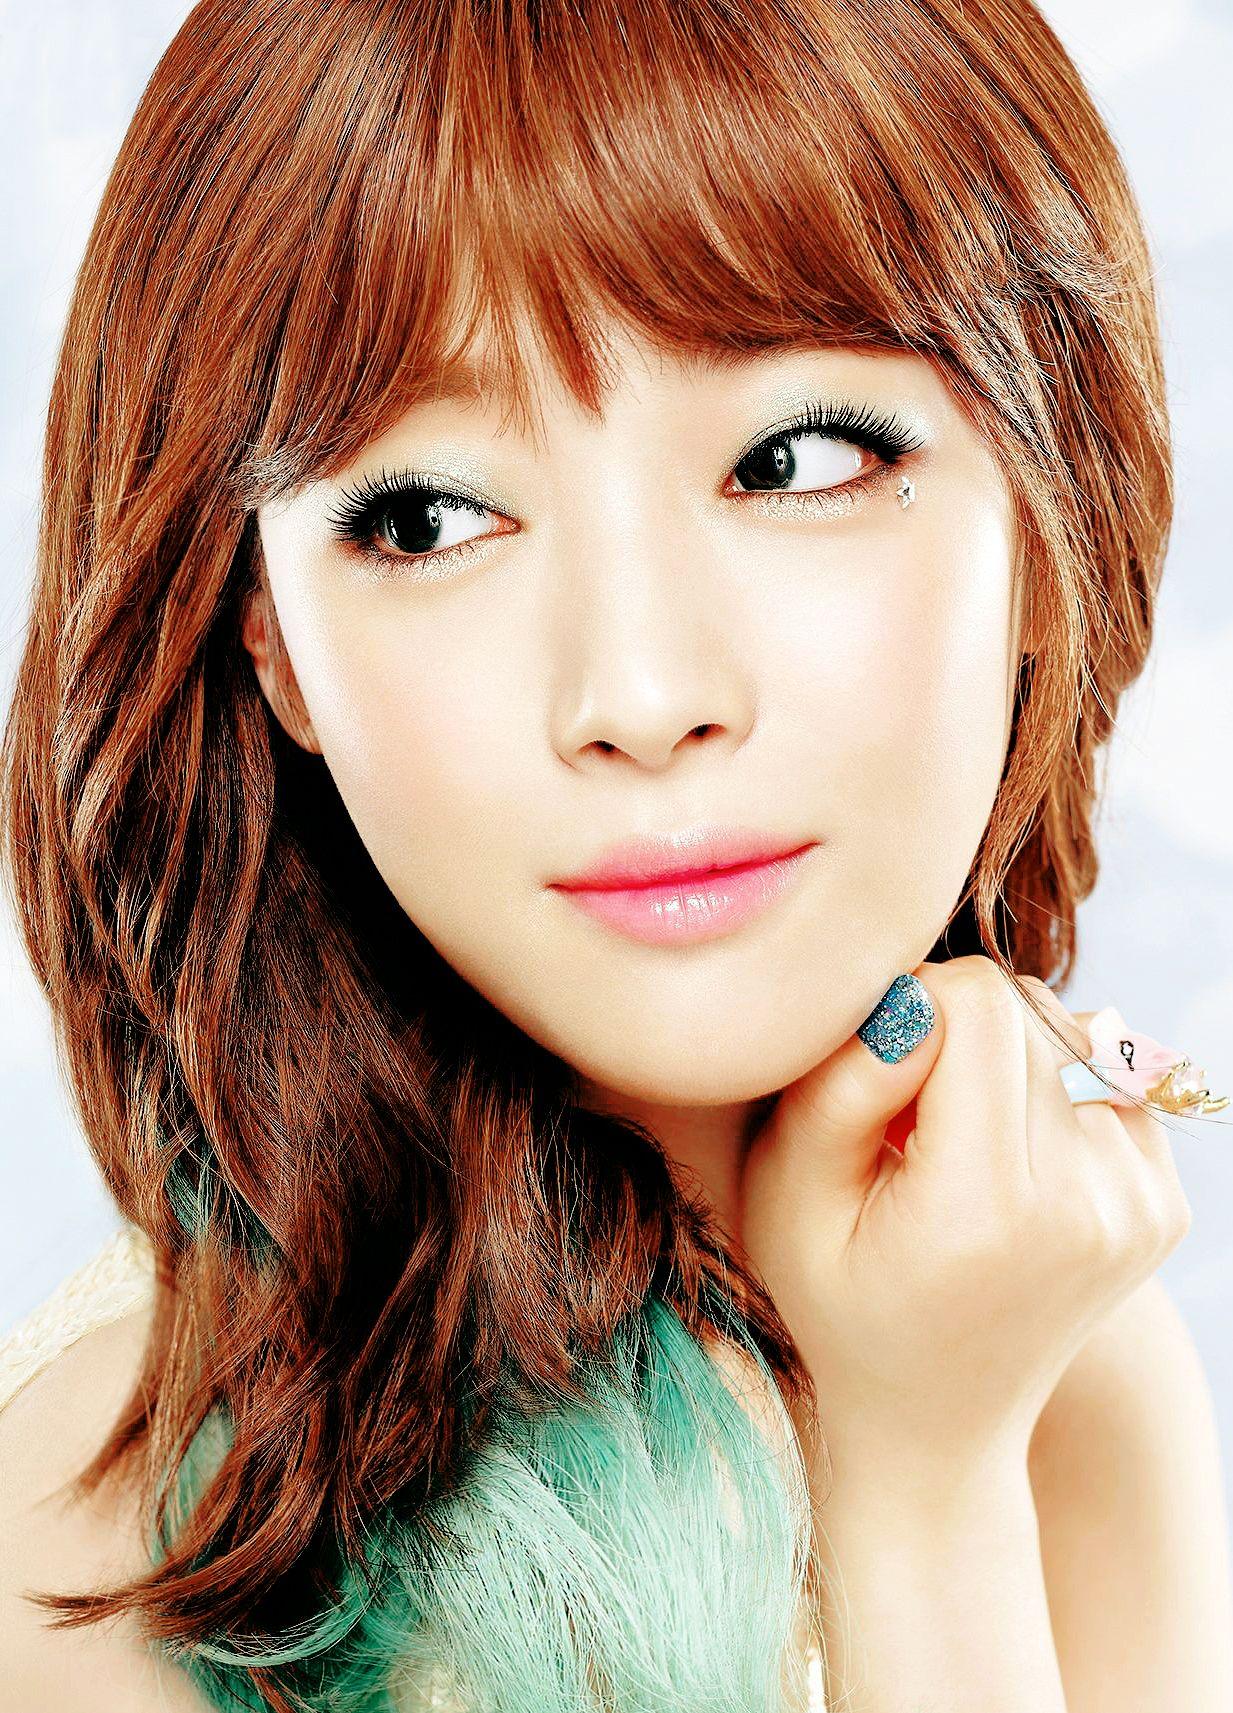 F X Fx Victoria Victoria Song Qian Amber Amber Liu Luna Sunyoung Sulli Jinri Choijin K Hair Style Korea Makeup Tips For Brown Eyes Celebrity Makeup